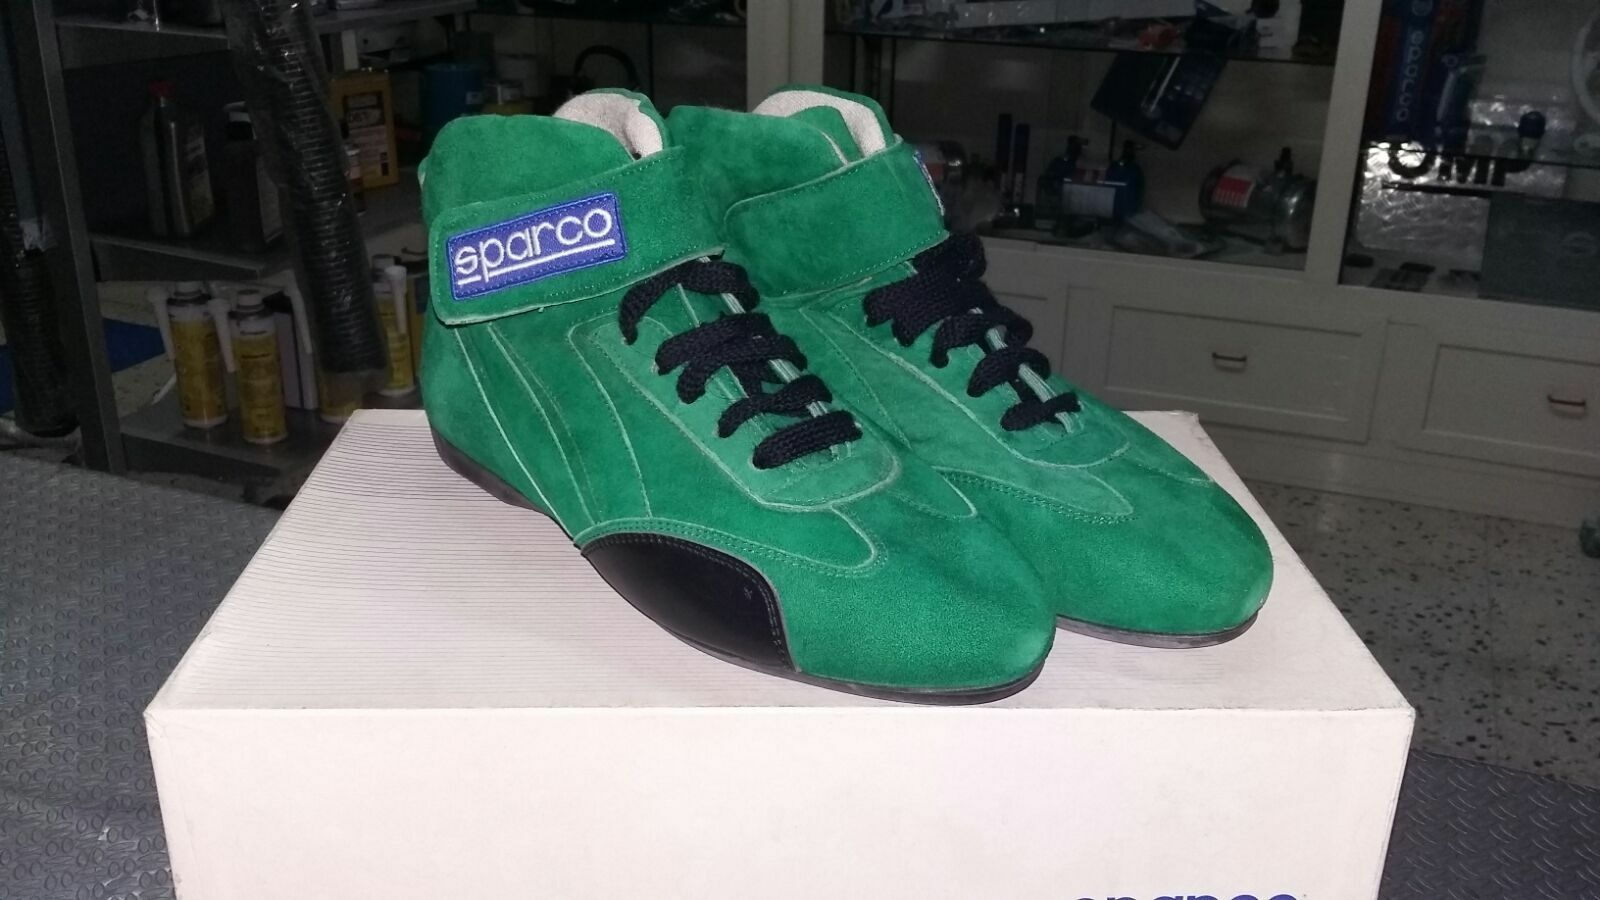 zapatos SPARCO OMOLOGAZIONE SCADUTA IGNIFUGHE PER PER PER GARE UISP O KART TAGLIA 42 USED 036744